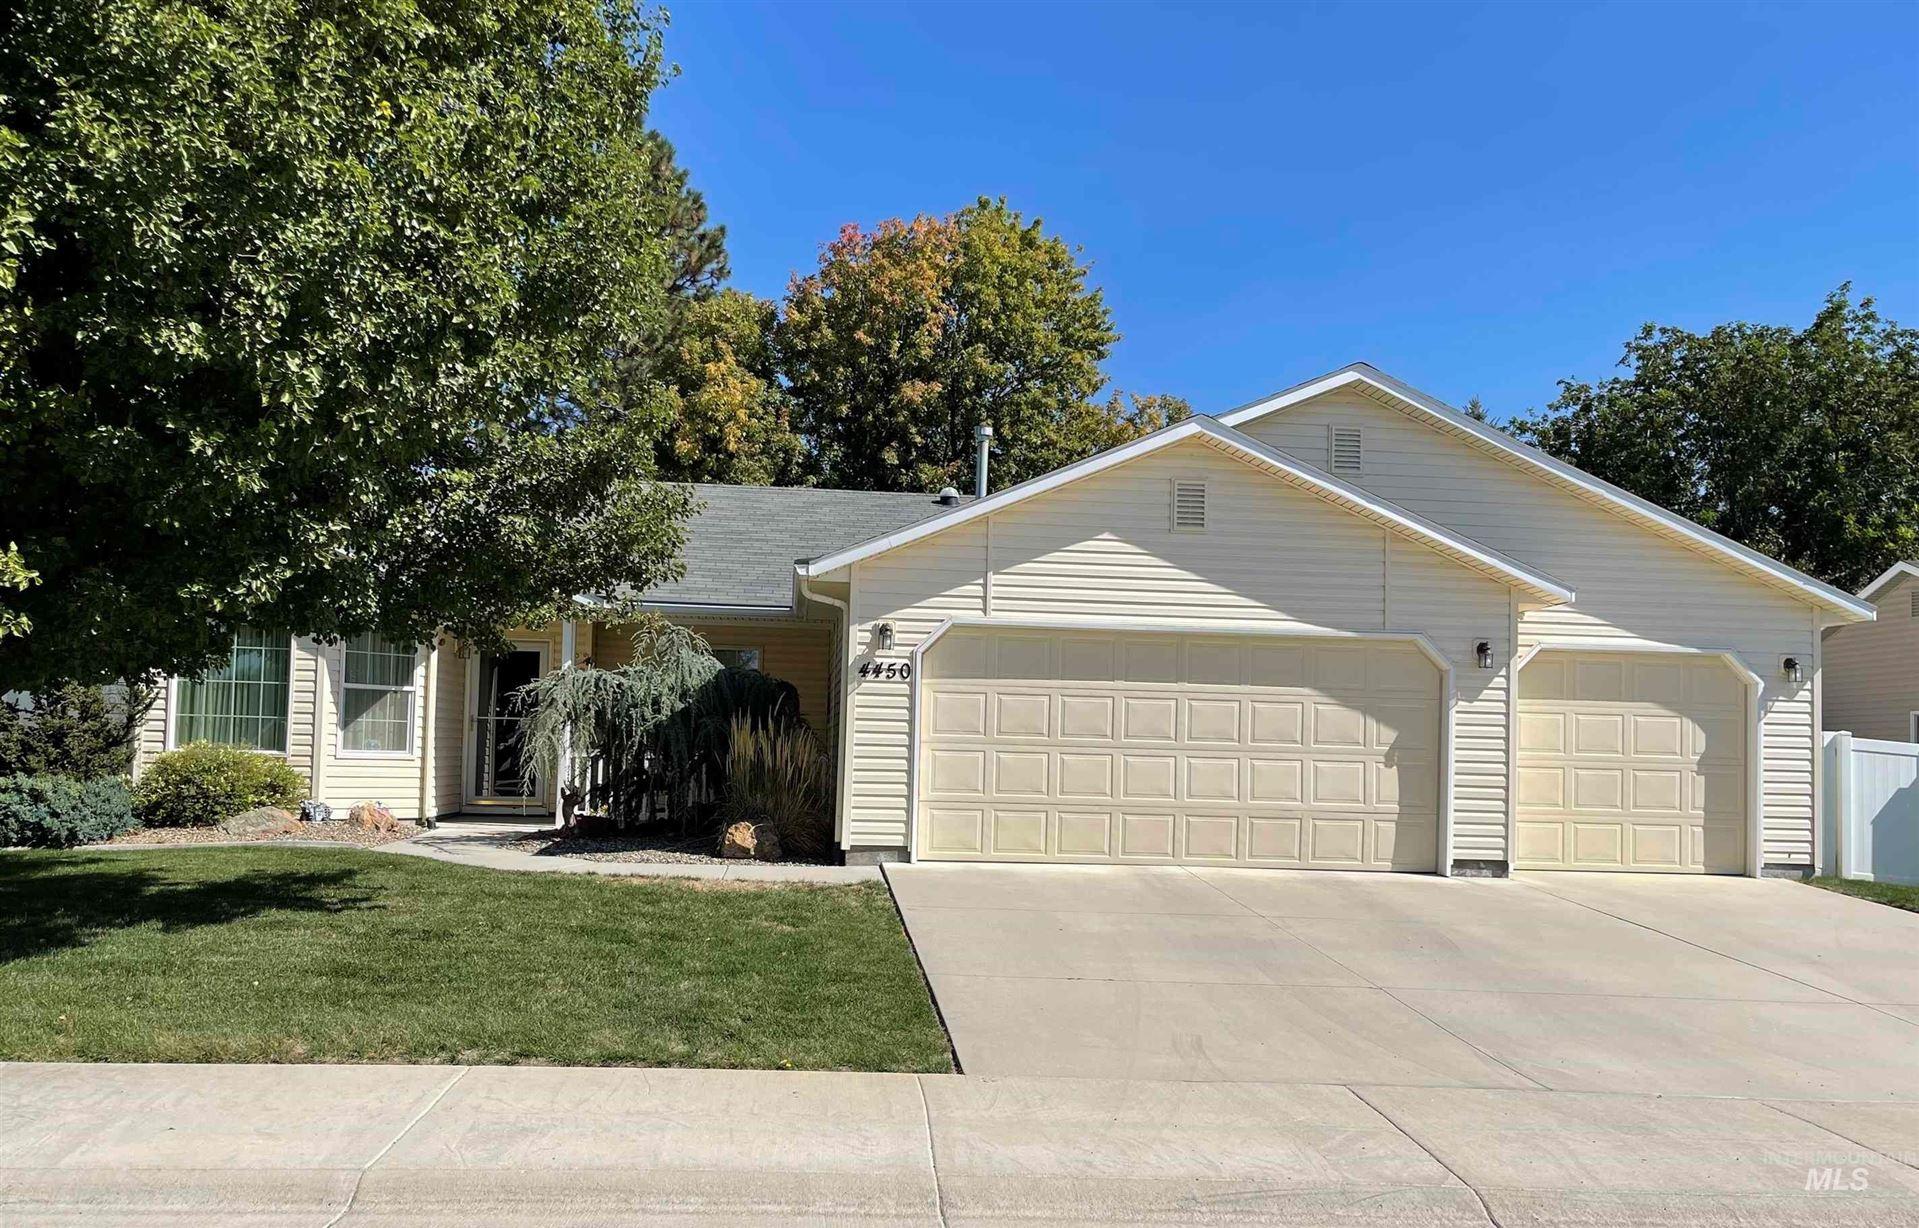 Photo of 4450 S Corbari Ave, Boise, ID 83709 (MLS # 98819380)